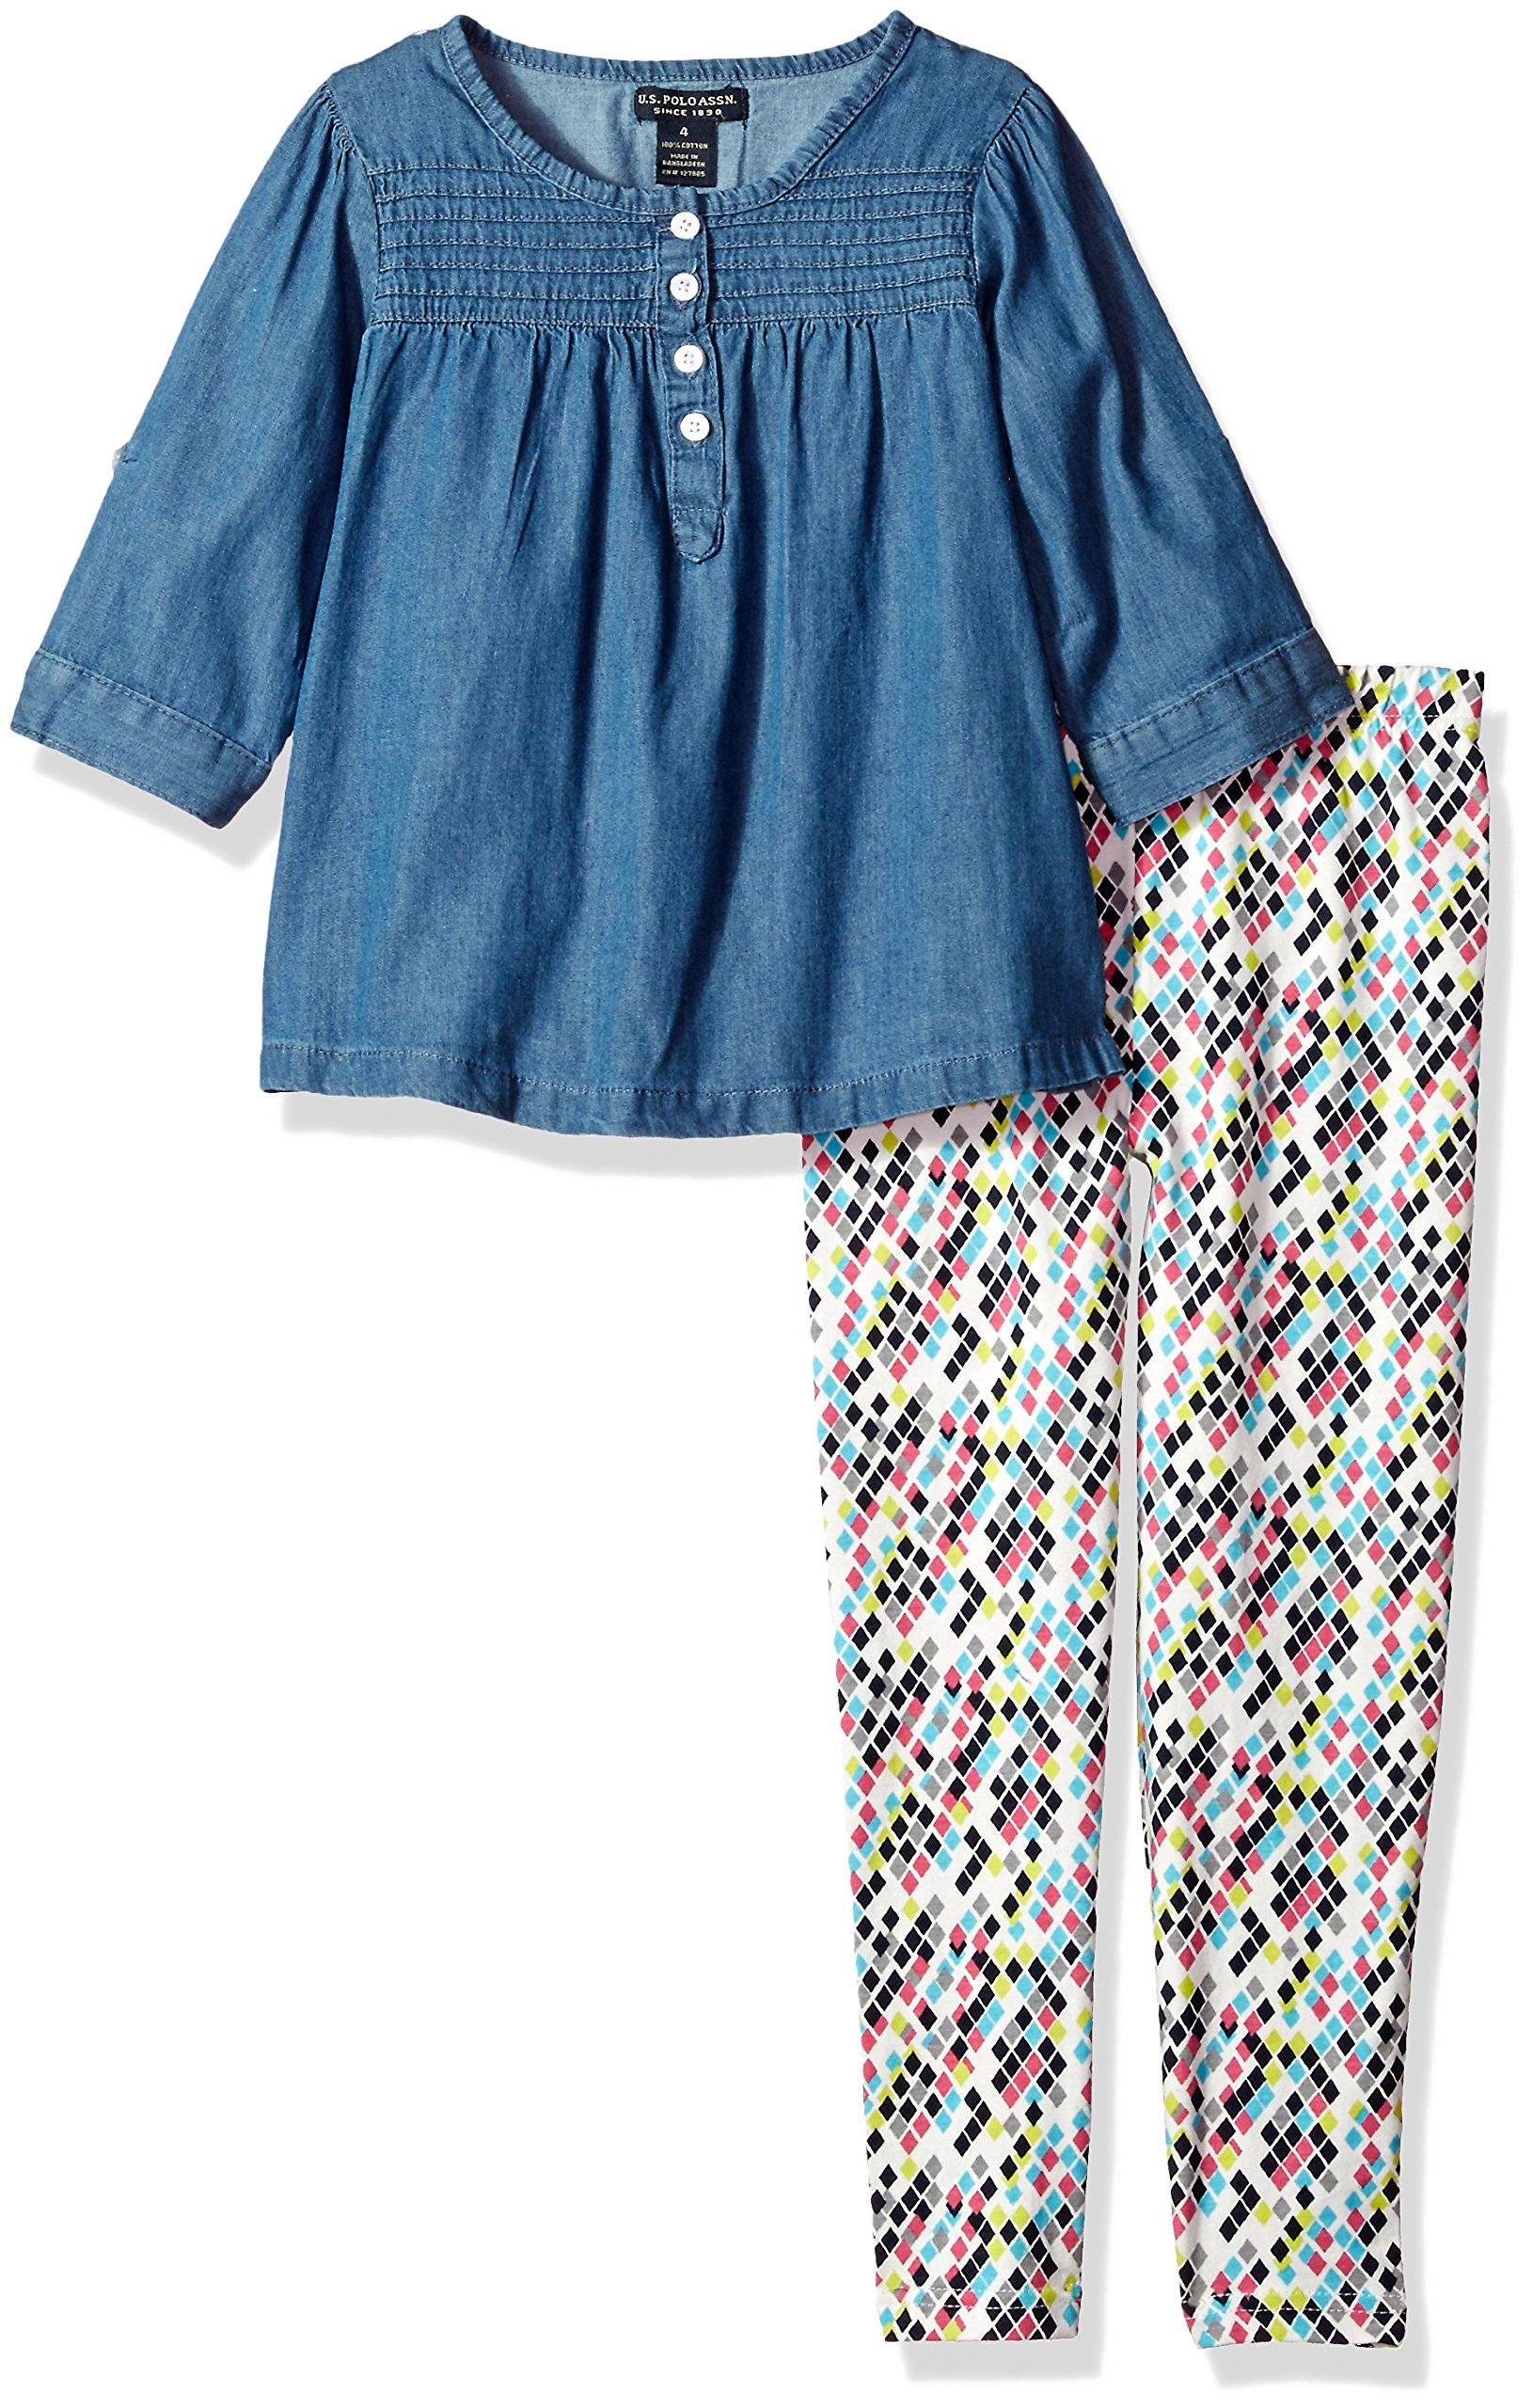 U.S. Polo Assn. Girls' Big Fashion Top and Legging Set, Blue Wash-KZ36, 10 by U.S. Polo Assn. (Image #2)